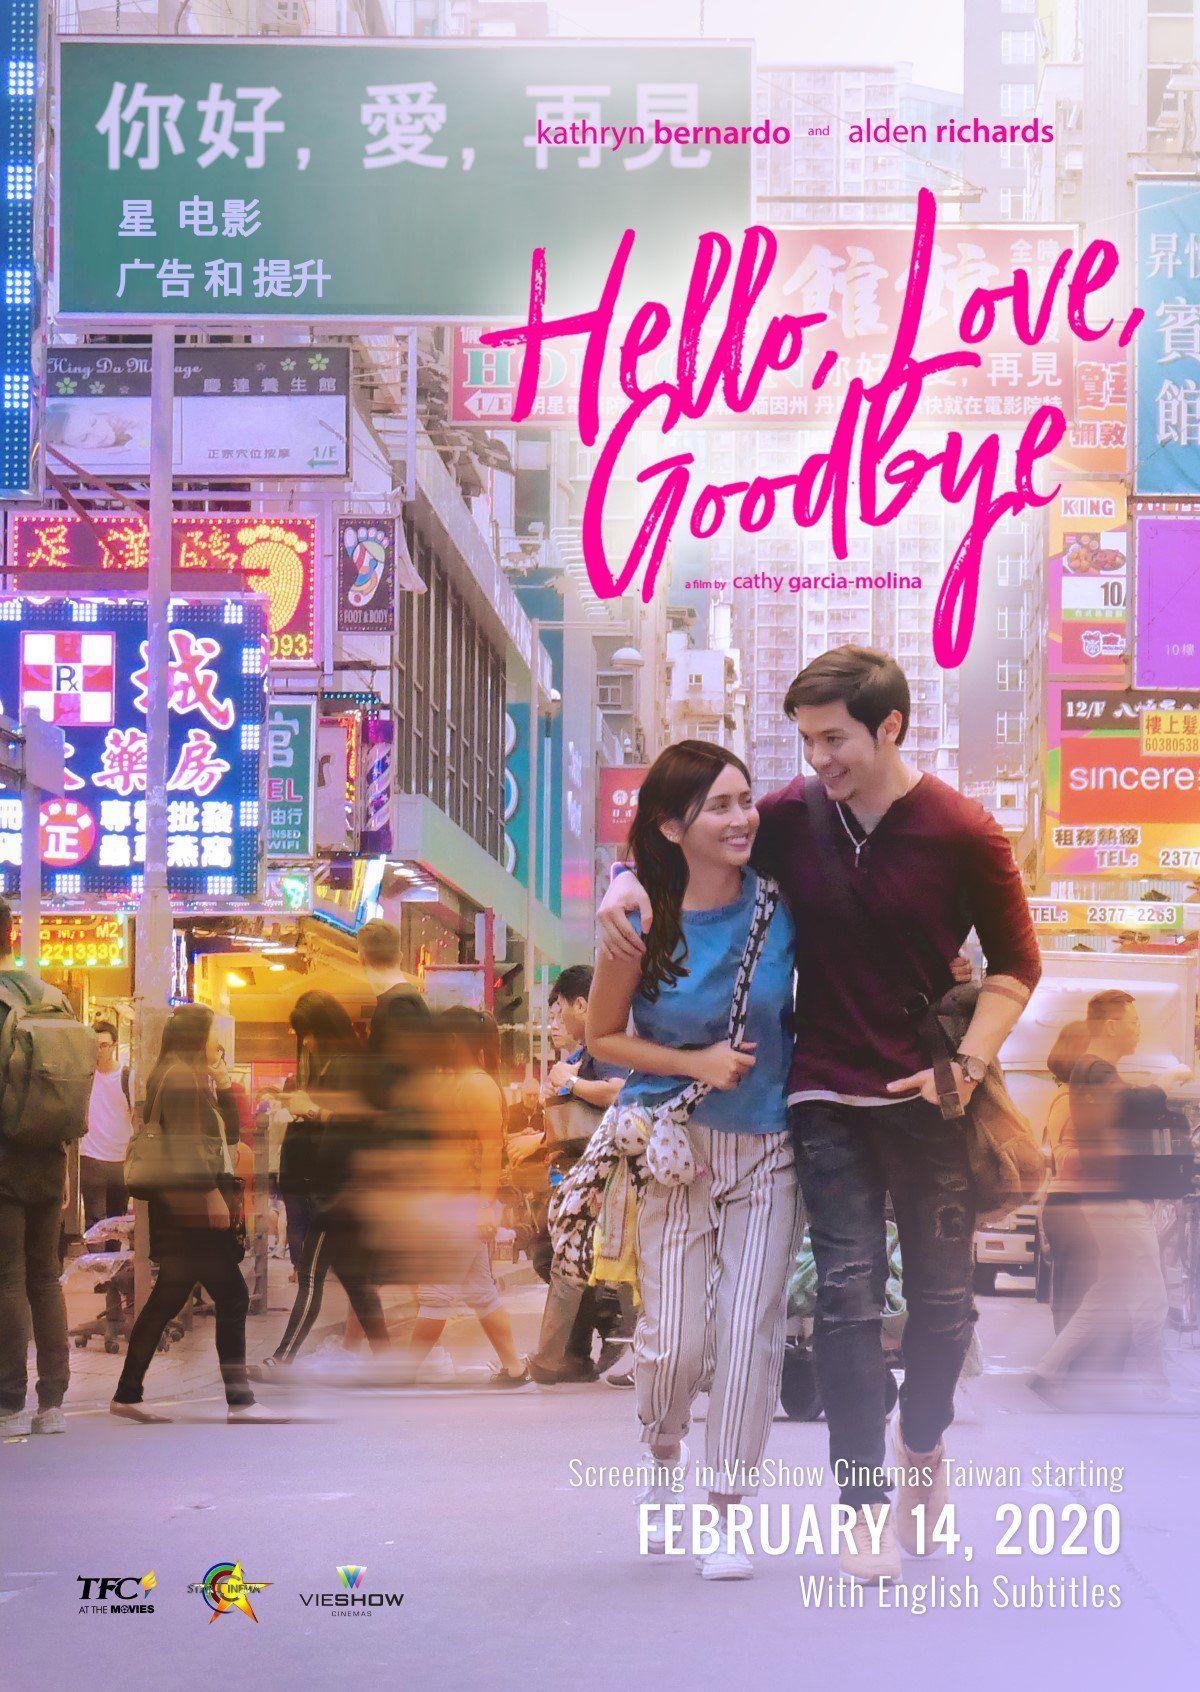 Dear Other Self 2017 Starring Jodi St Maria Joseph Marco Xian Lim Full Movies Online Free Movies Online Full Movies Online Free